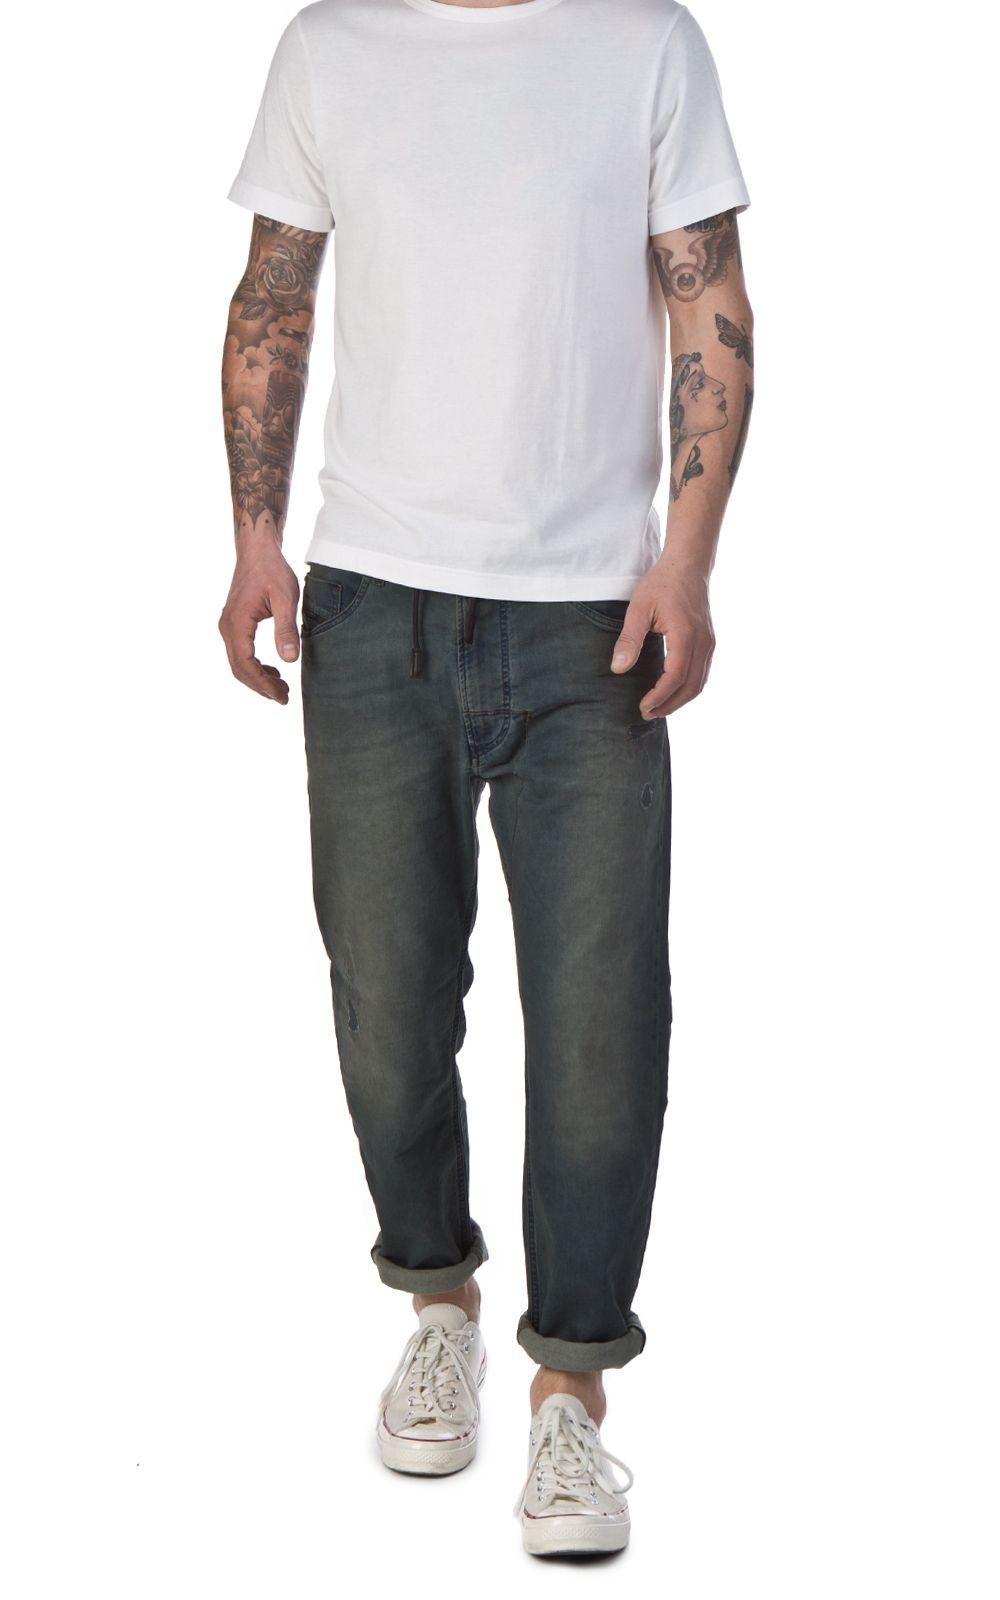 3f6a6642528d Diesel Narrot-NE Sweat Jeans 0856Z   Cultizm s New Arrivals 2016 ...